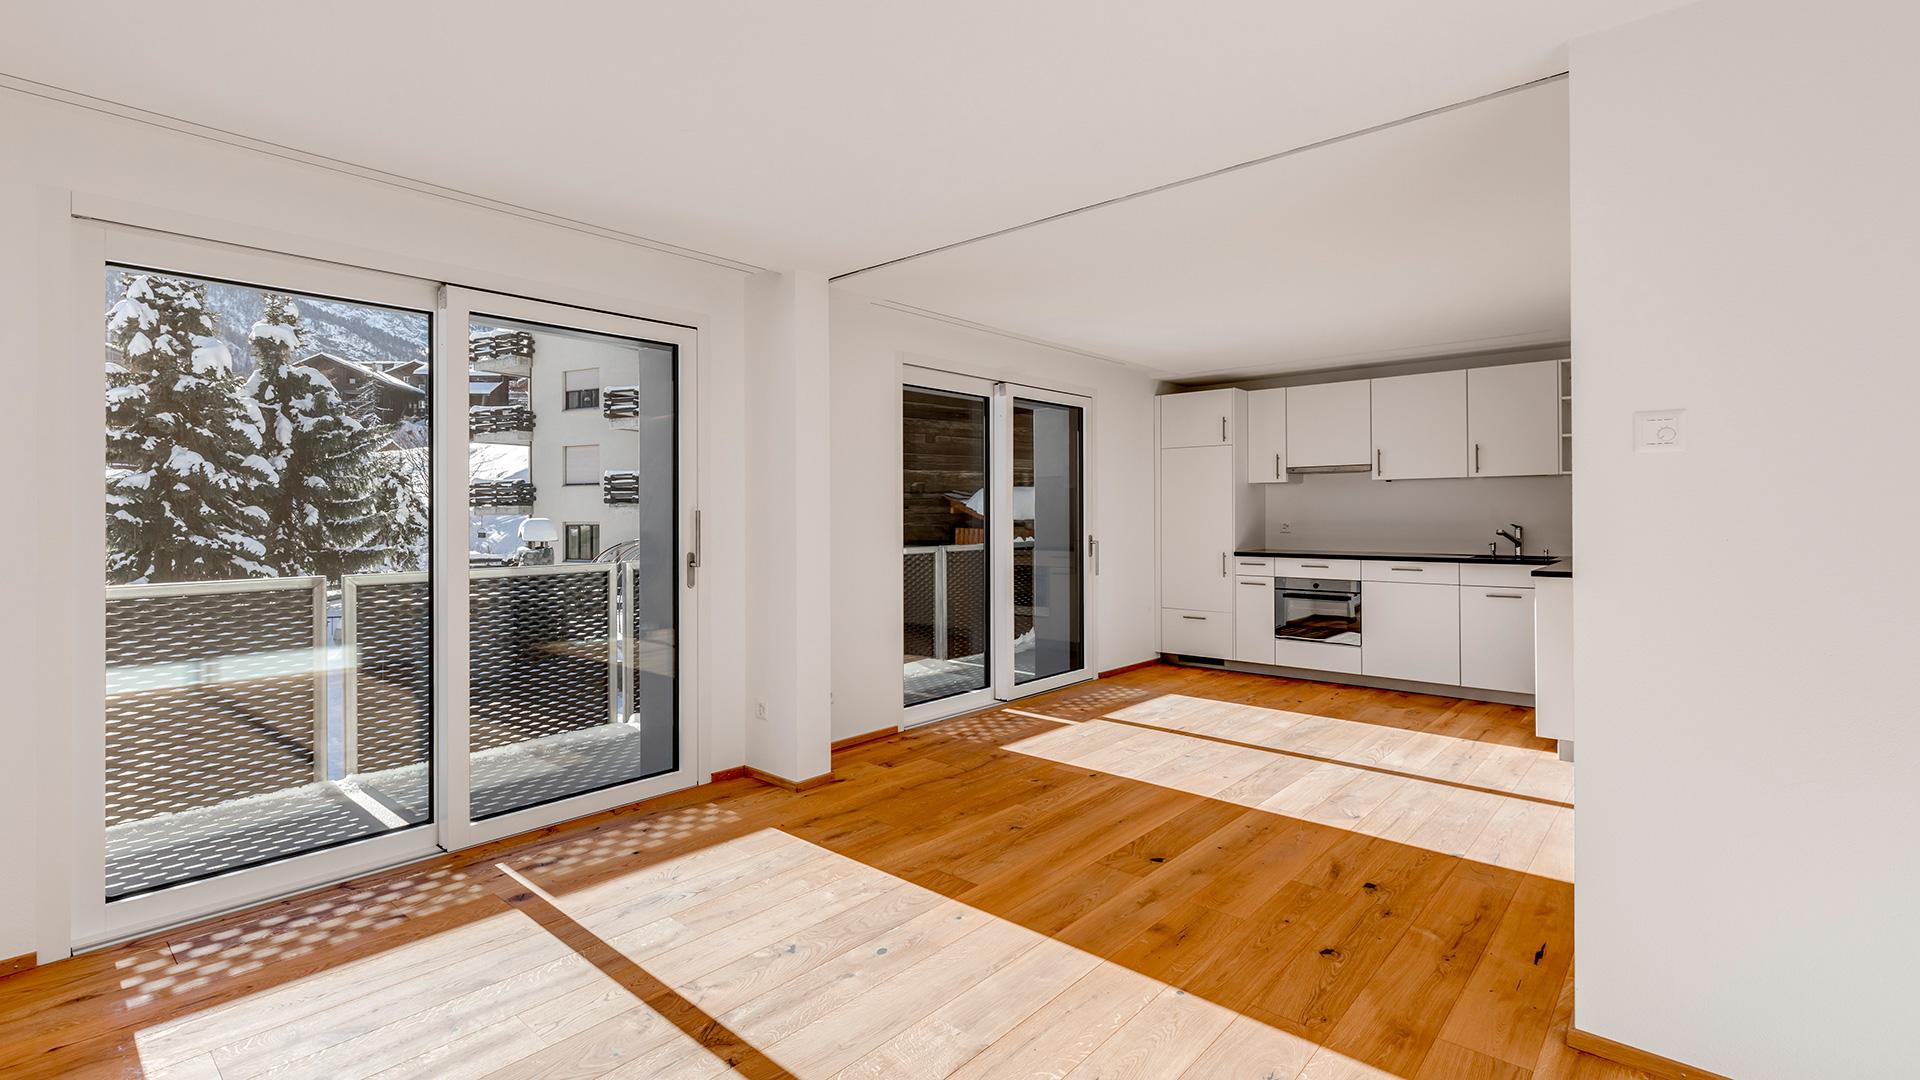 Haus Niklaus 2 Apartments, Switzerland